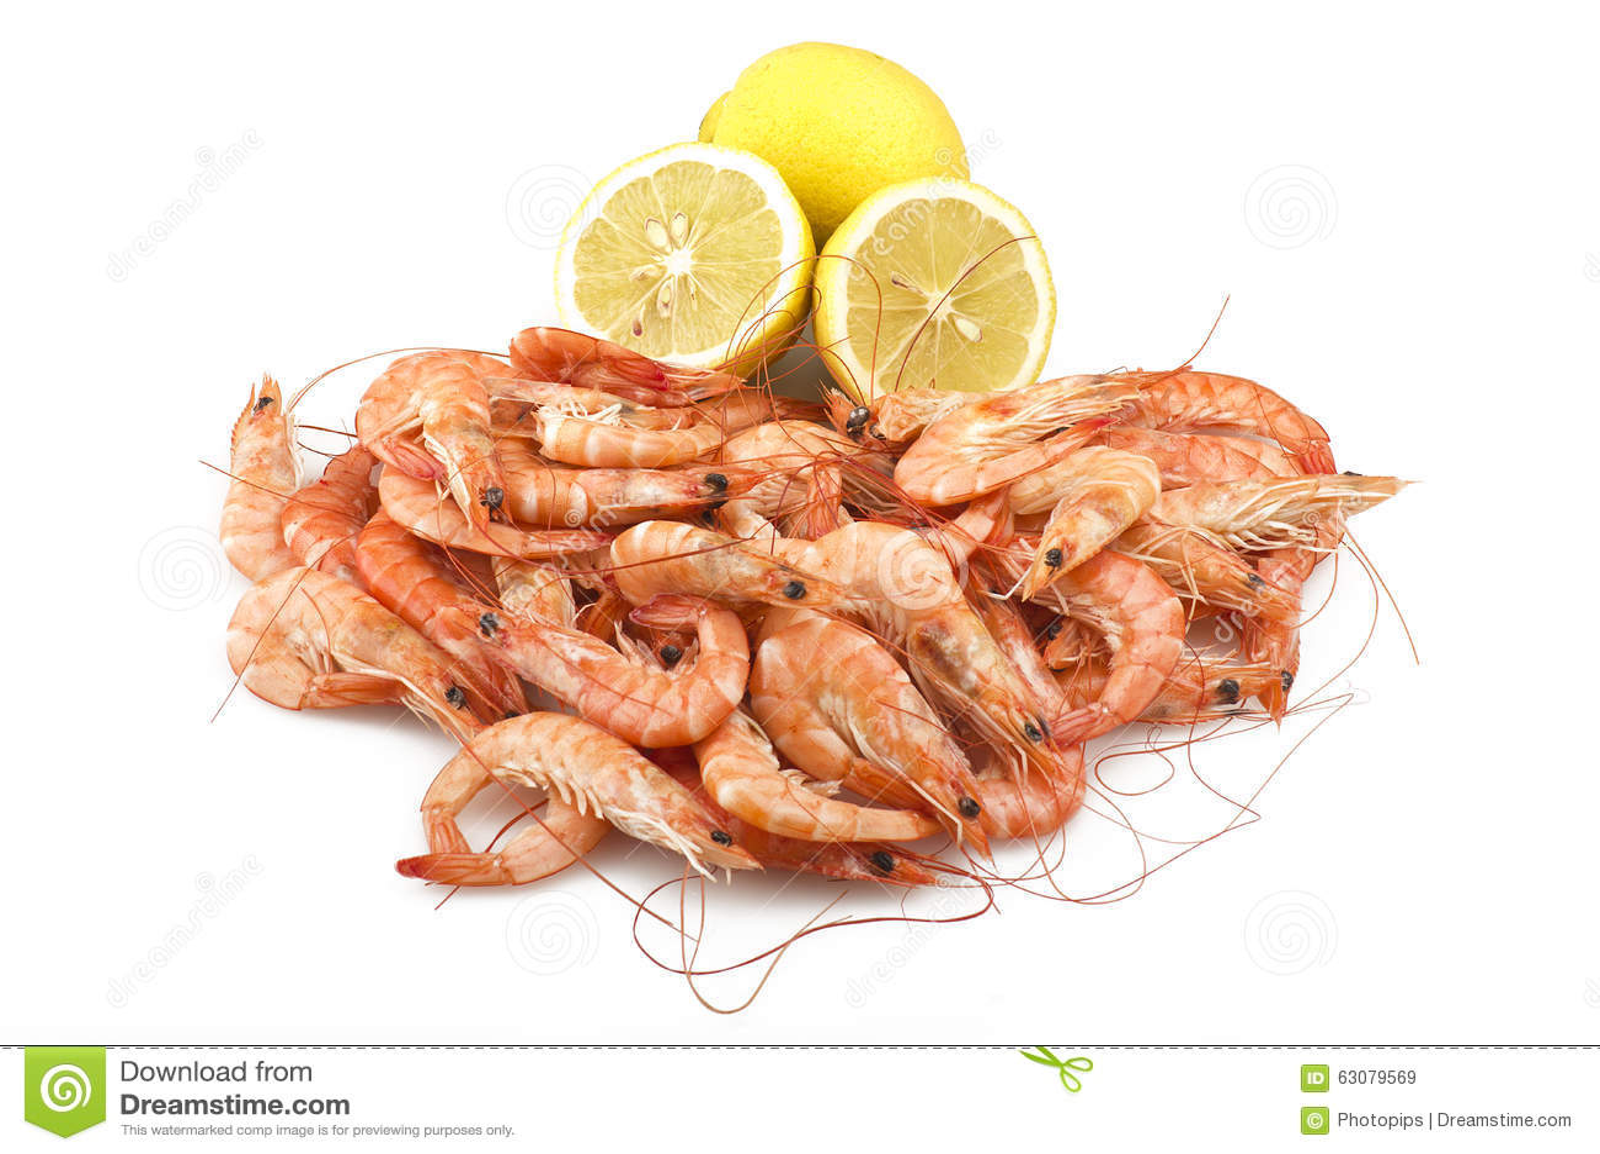 Download Crevette crue fraîche image stock. Image du prawn, seafood - 63079569